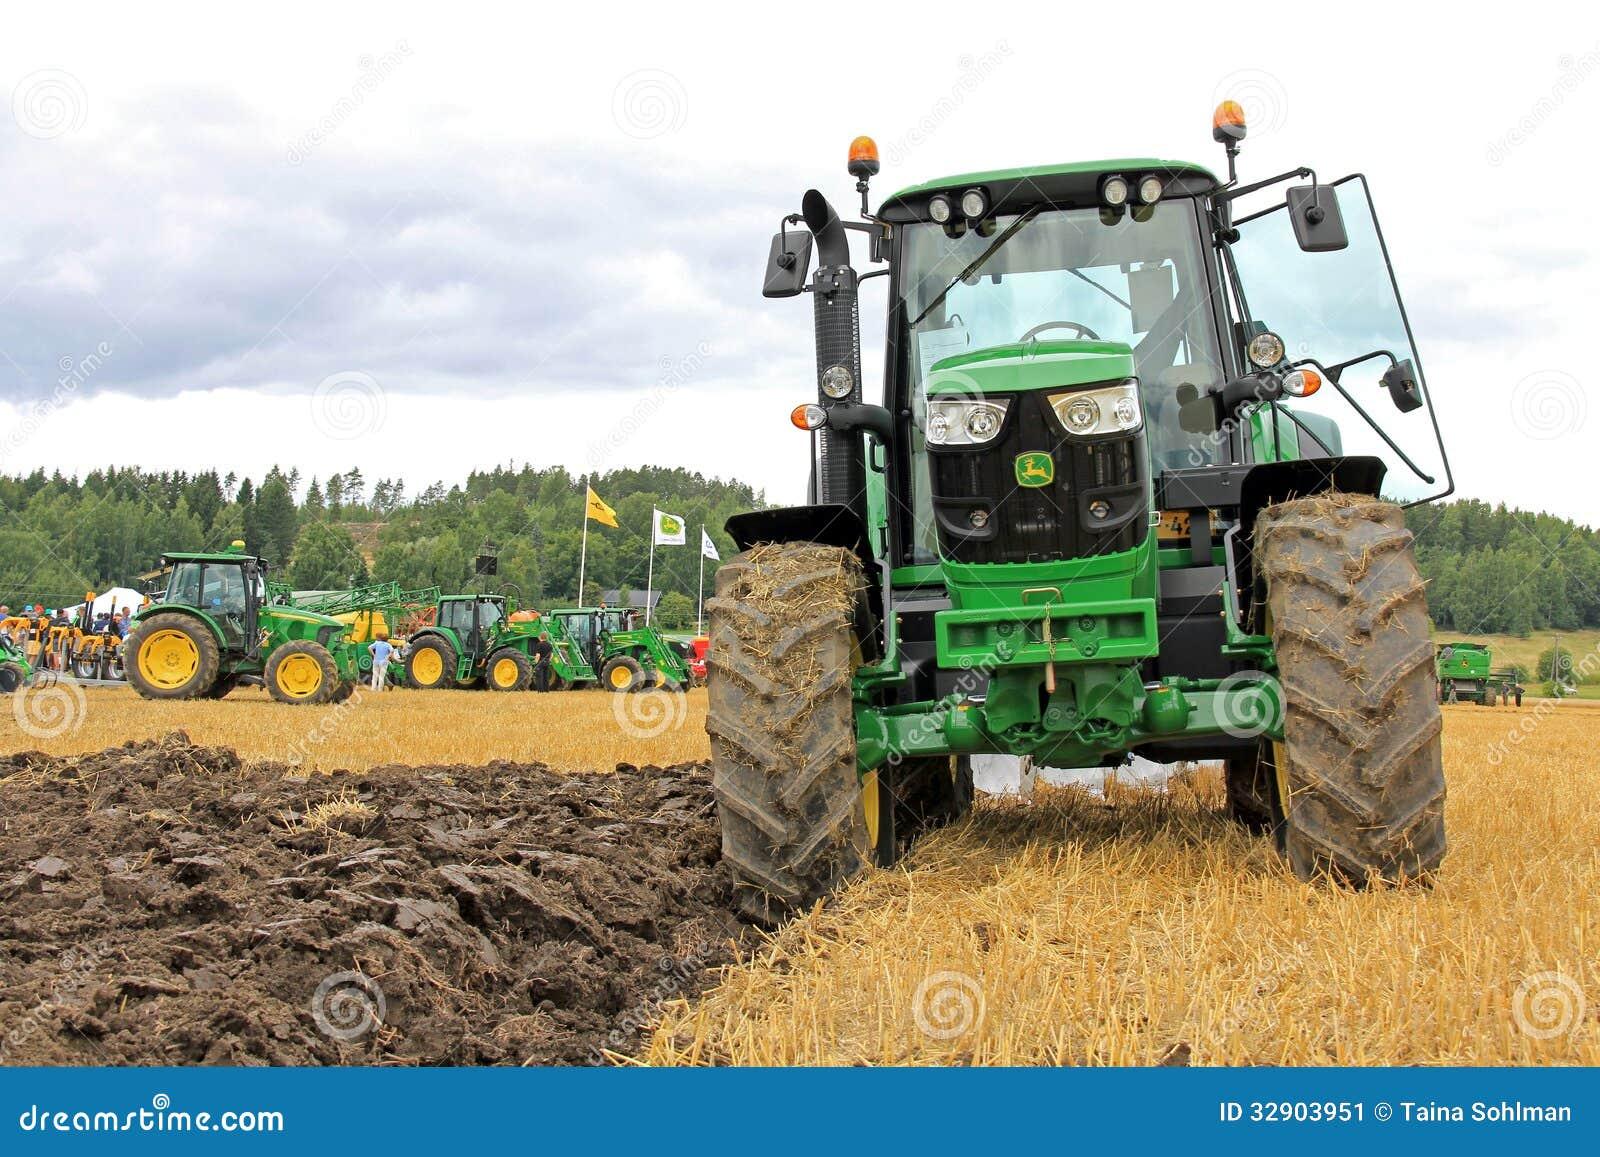 John deere 6150m agricultural tractor dans le salon de l - Salon de l agriculture machine agricole ...